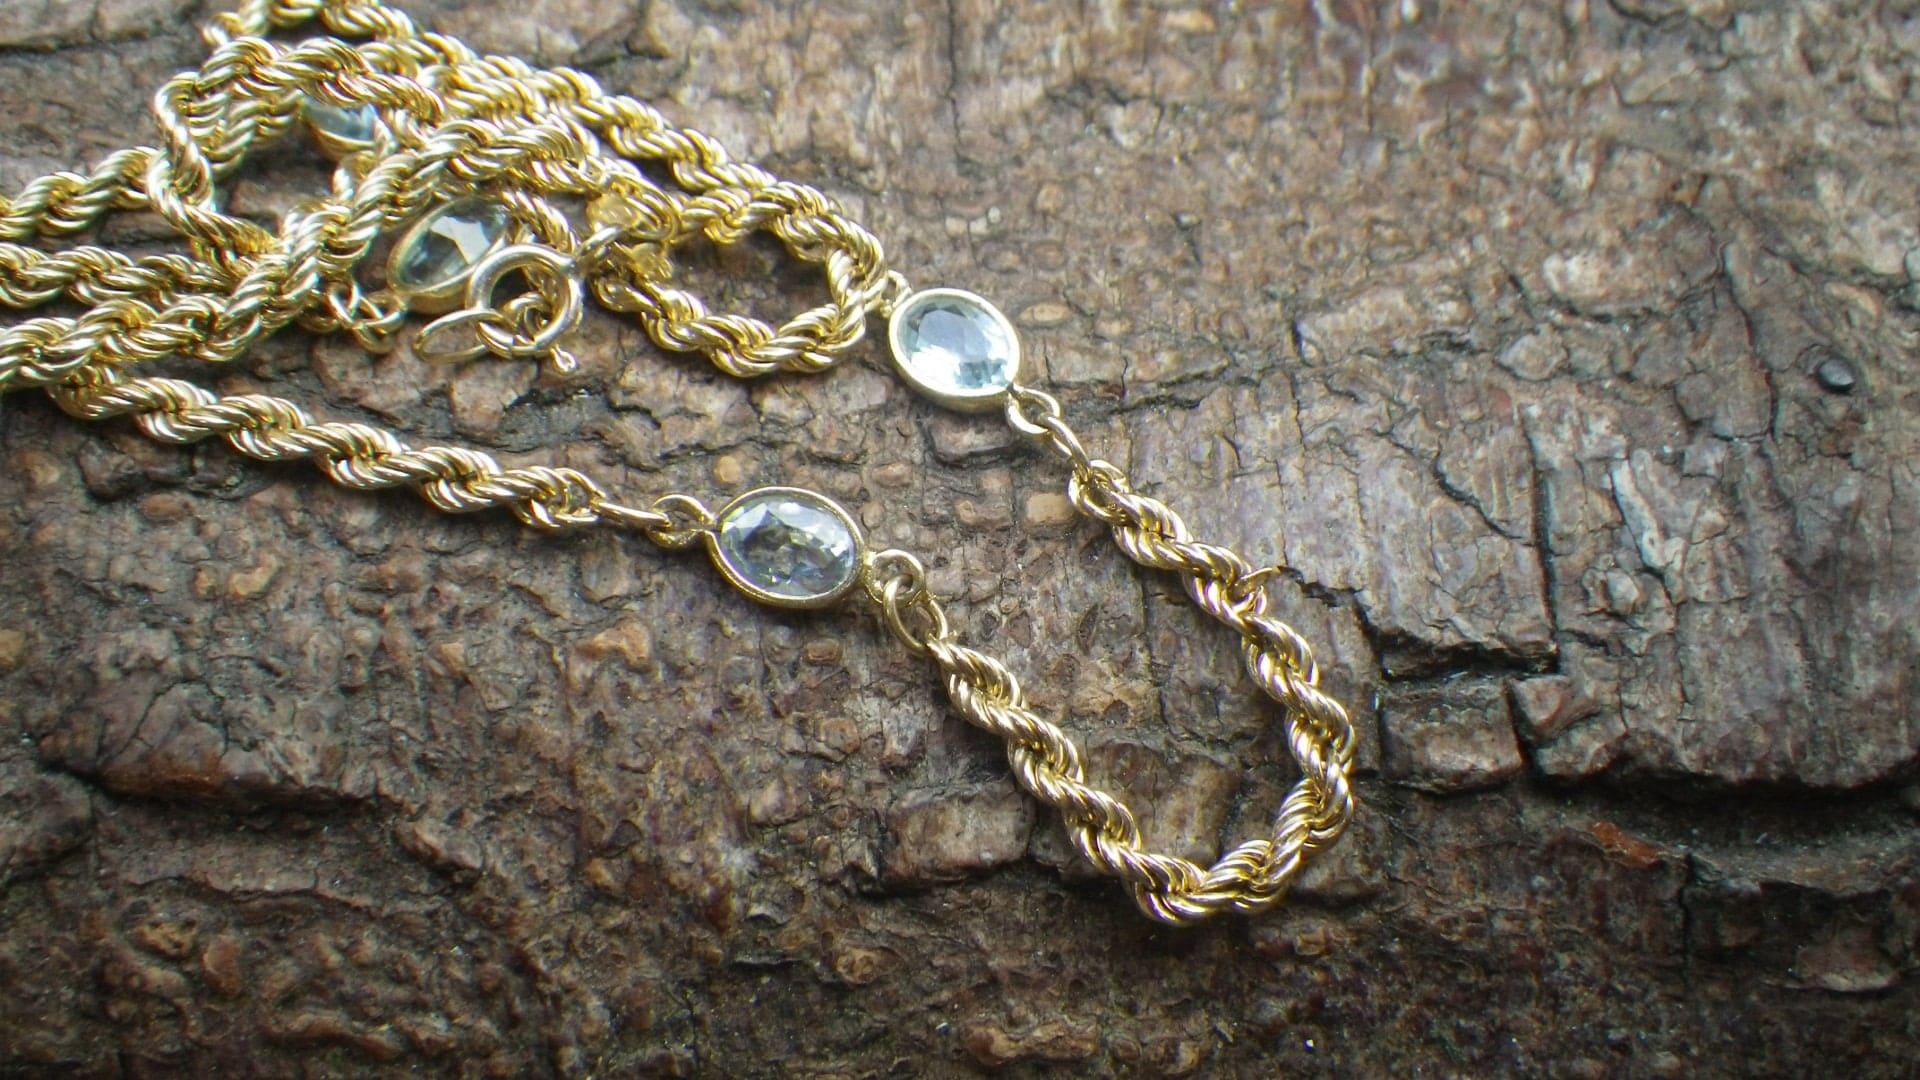 Unusual 9ct Yellow Gold Twist Rope Aquamarine Topaz Necklace